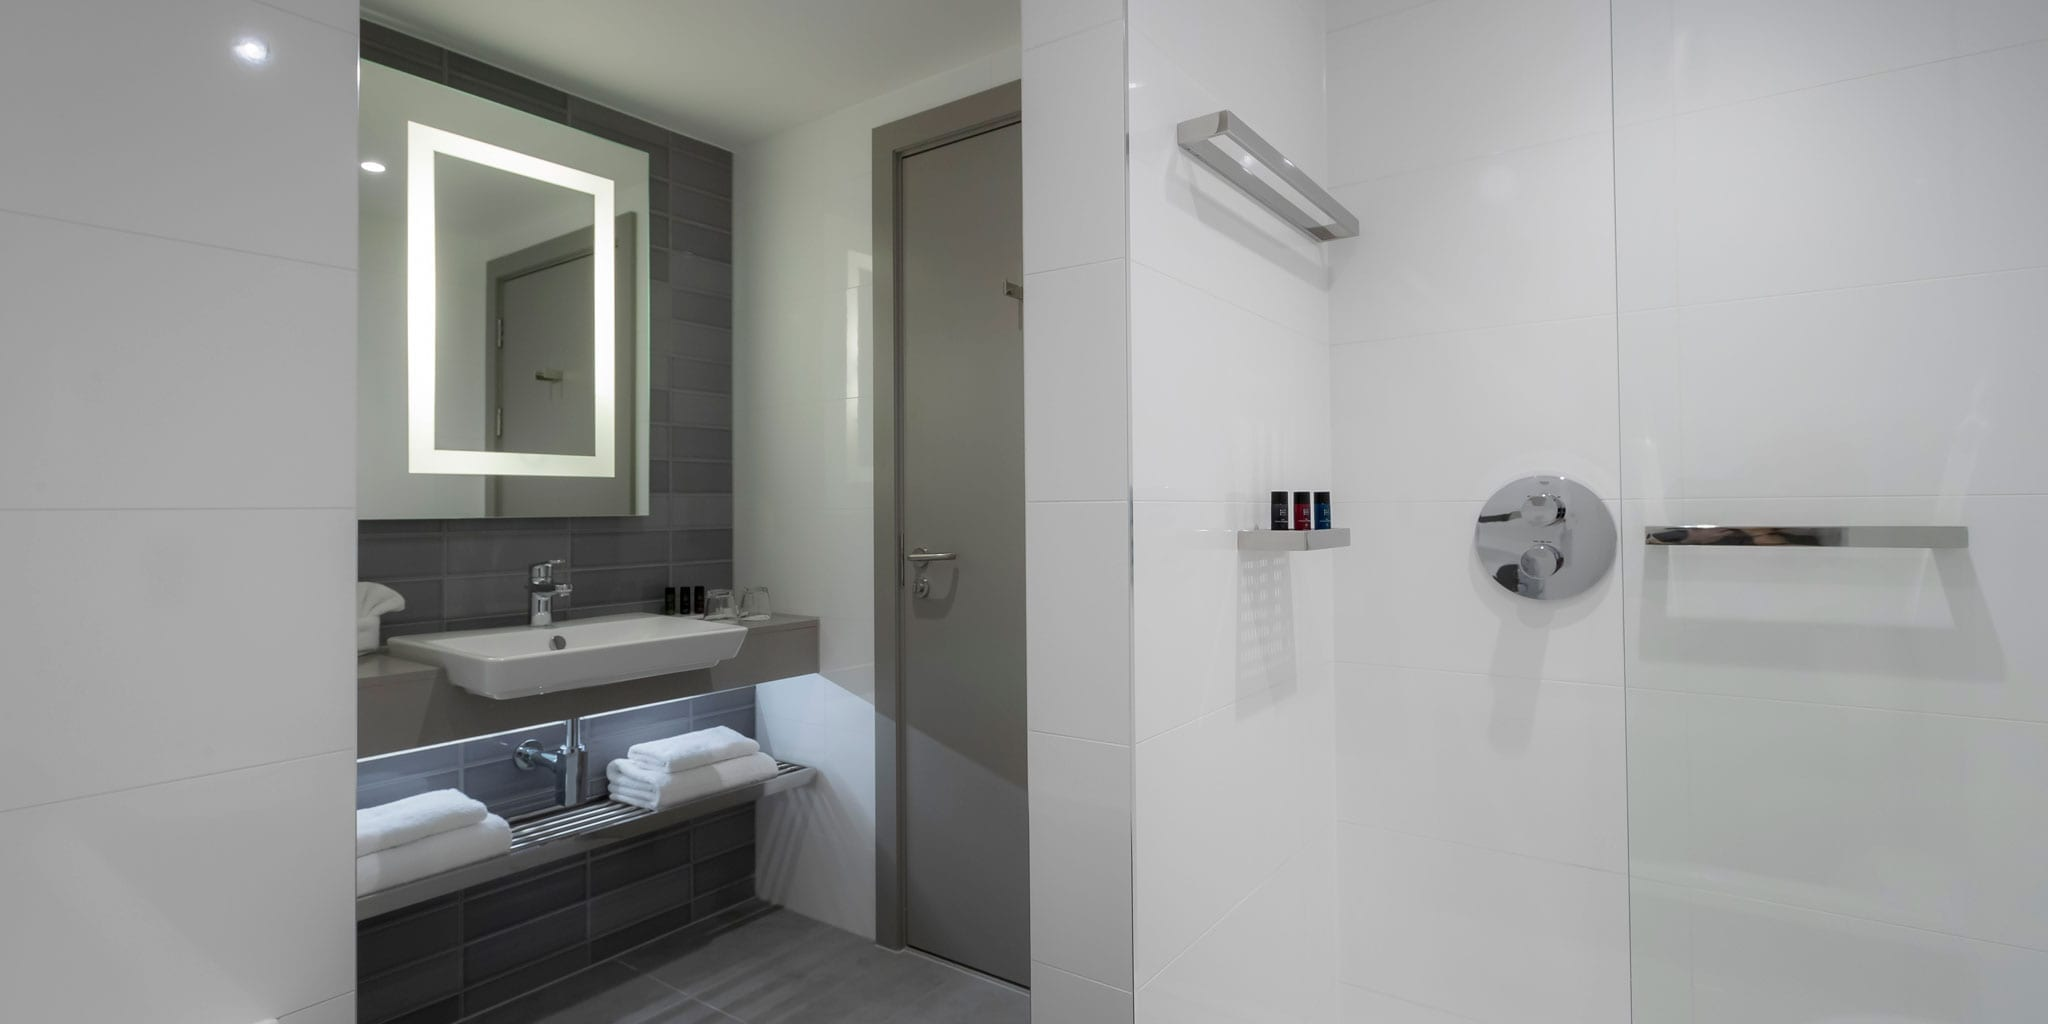 Bathroom in Charlemont hotel rooms